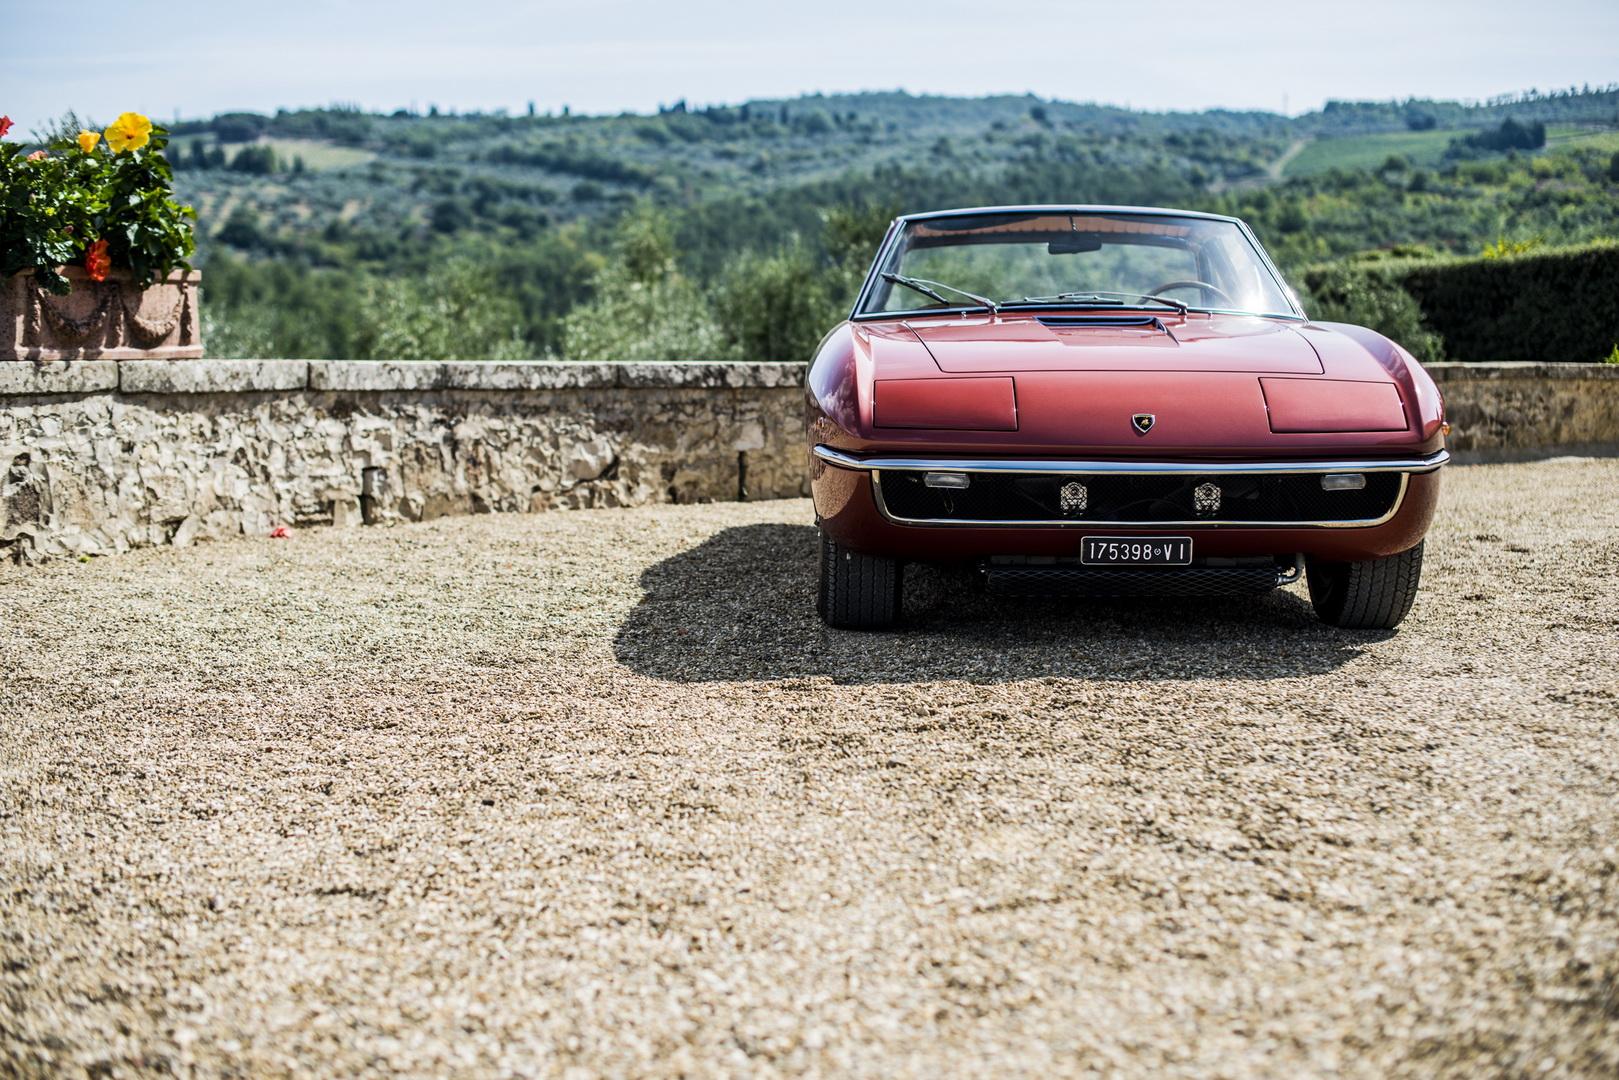 Lamborghini Islero and Espada 50th anniversary (31)